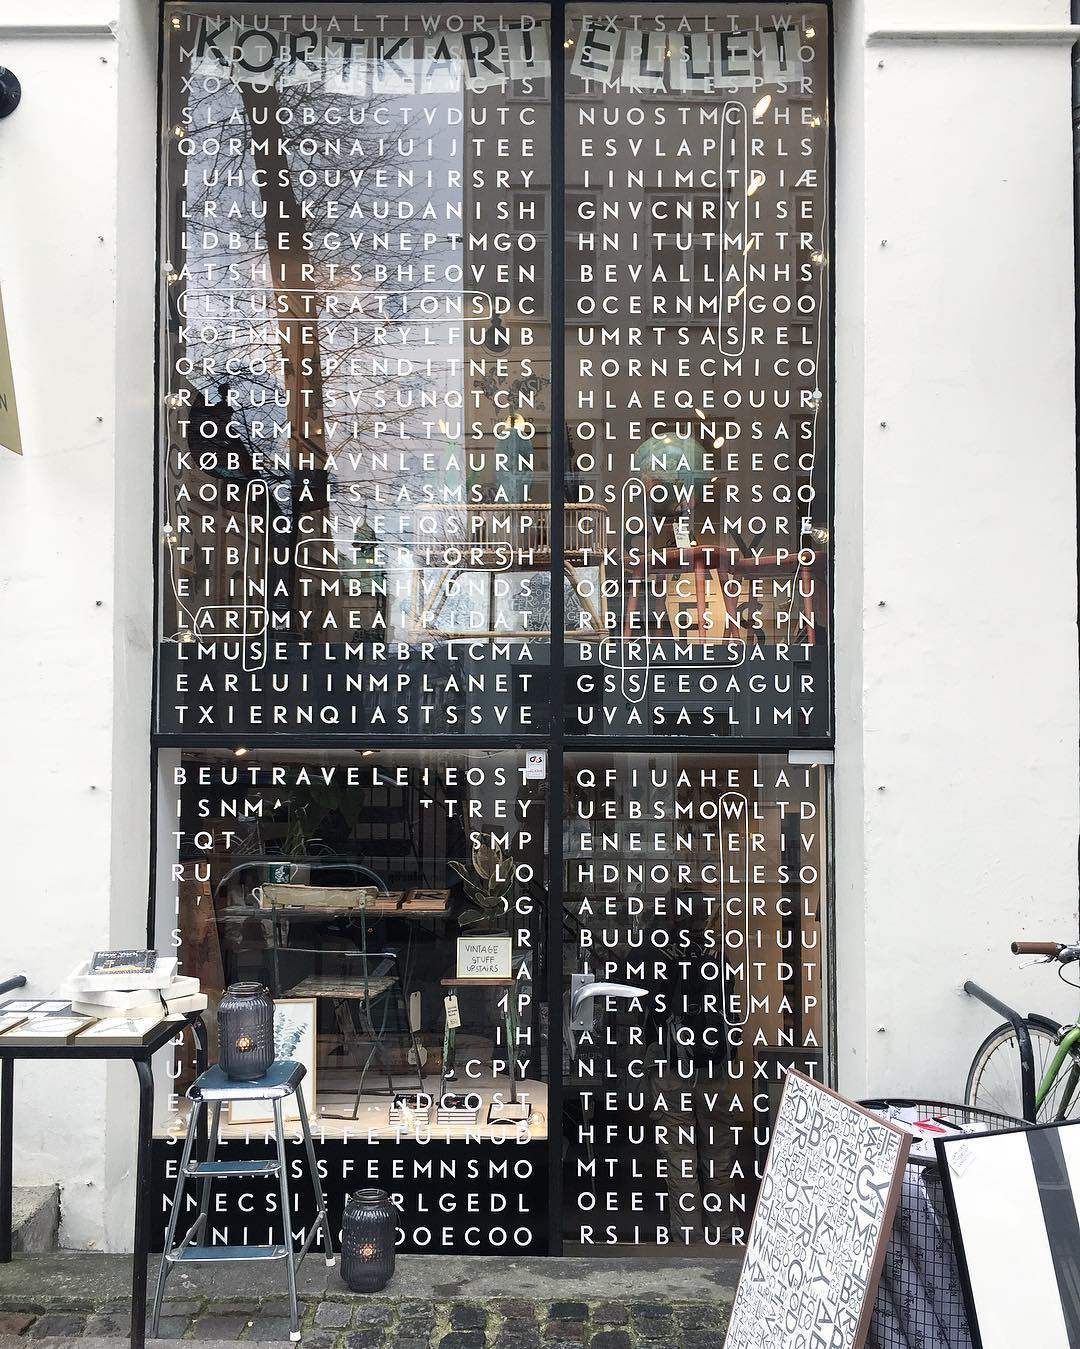 All the creative window designs in copenhagen